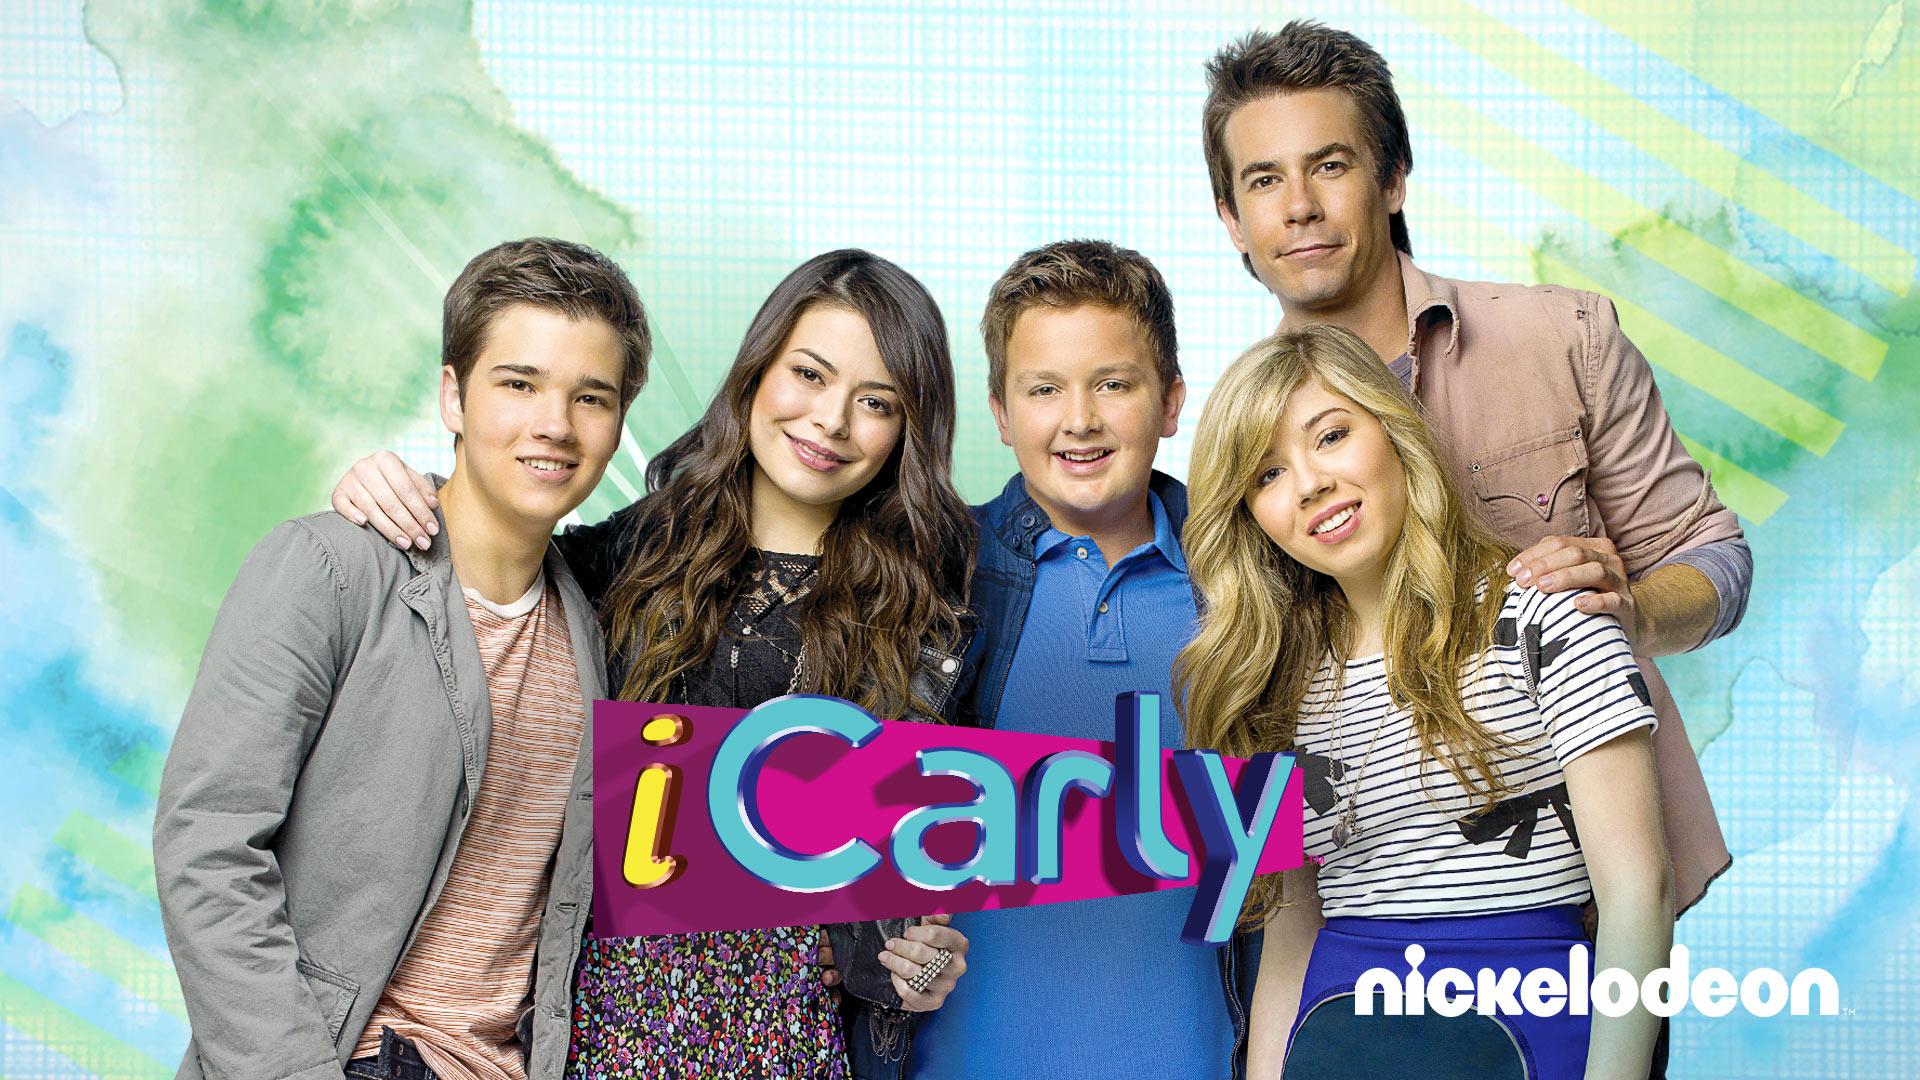 iCarly (2007) Season 1